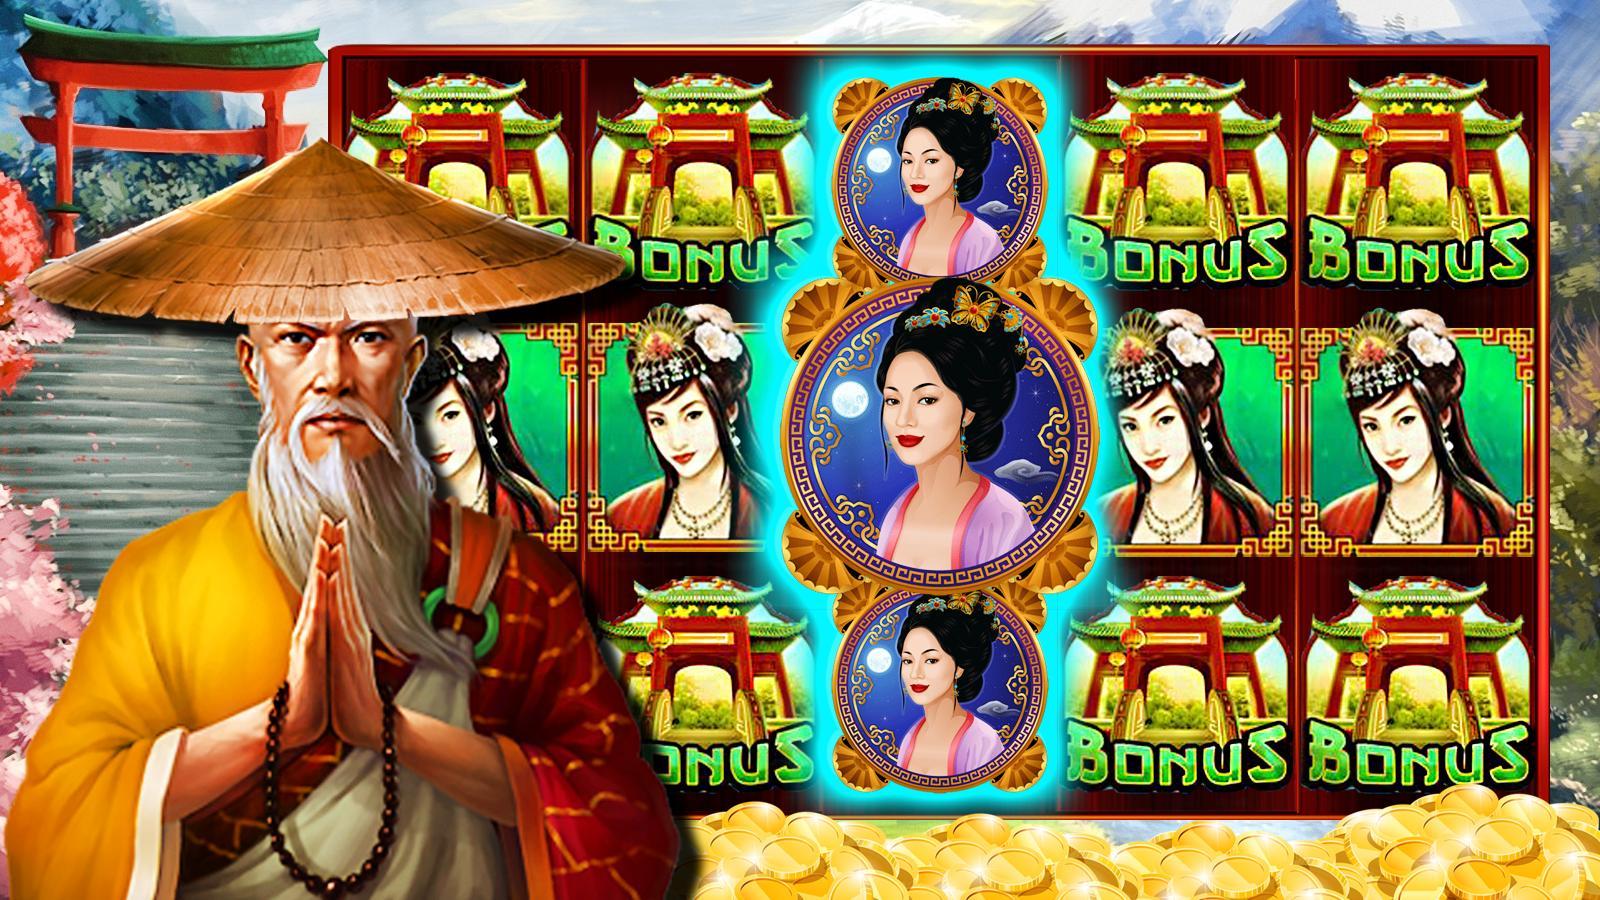 Slot Bonuses Images